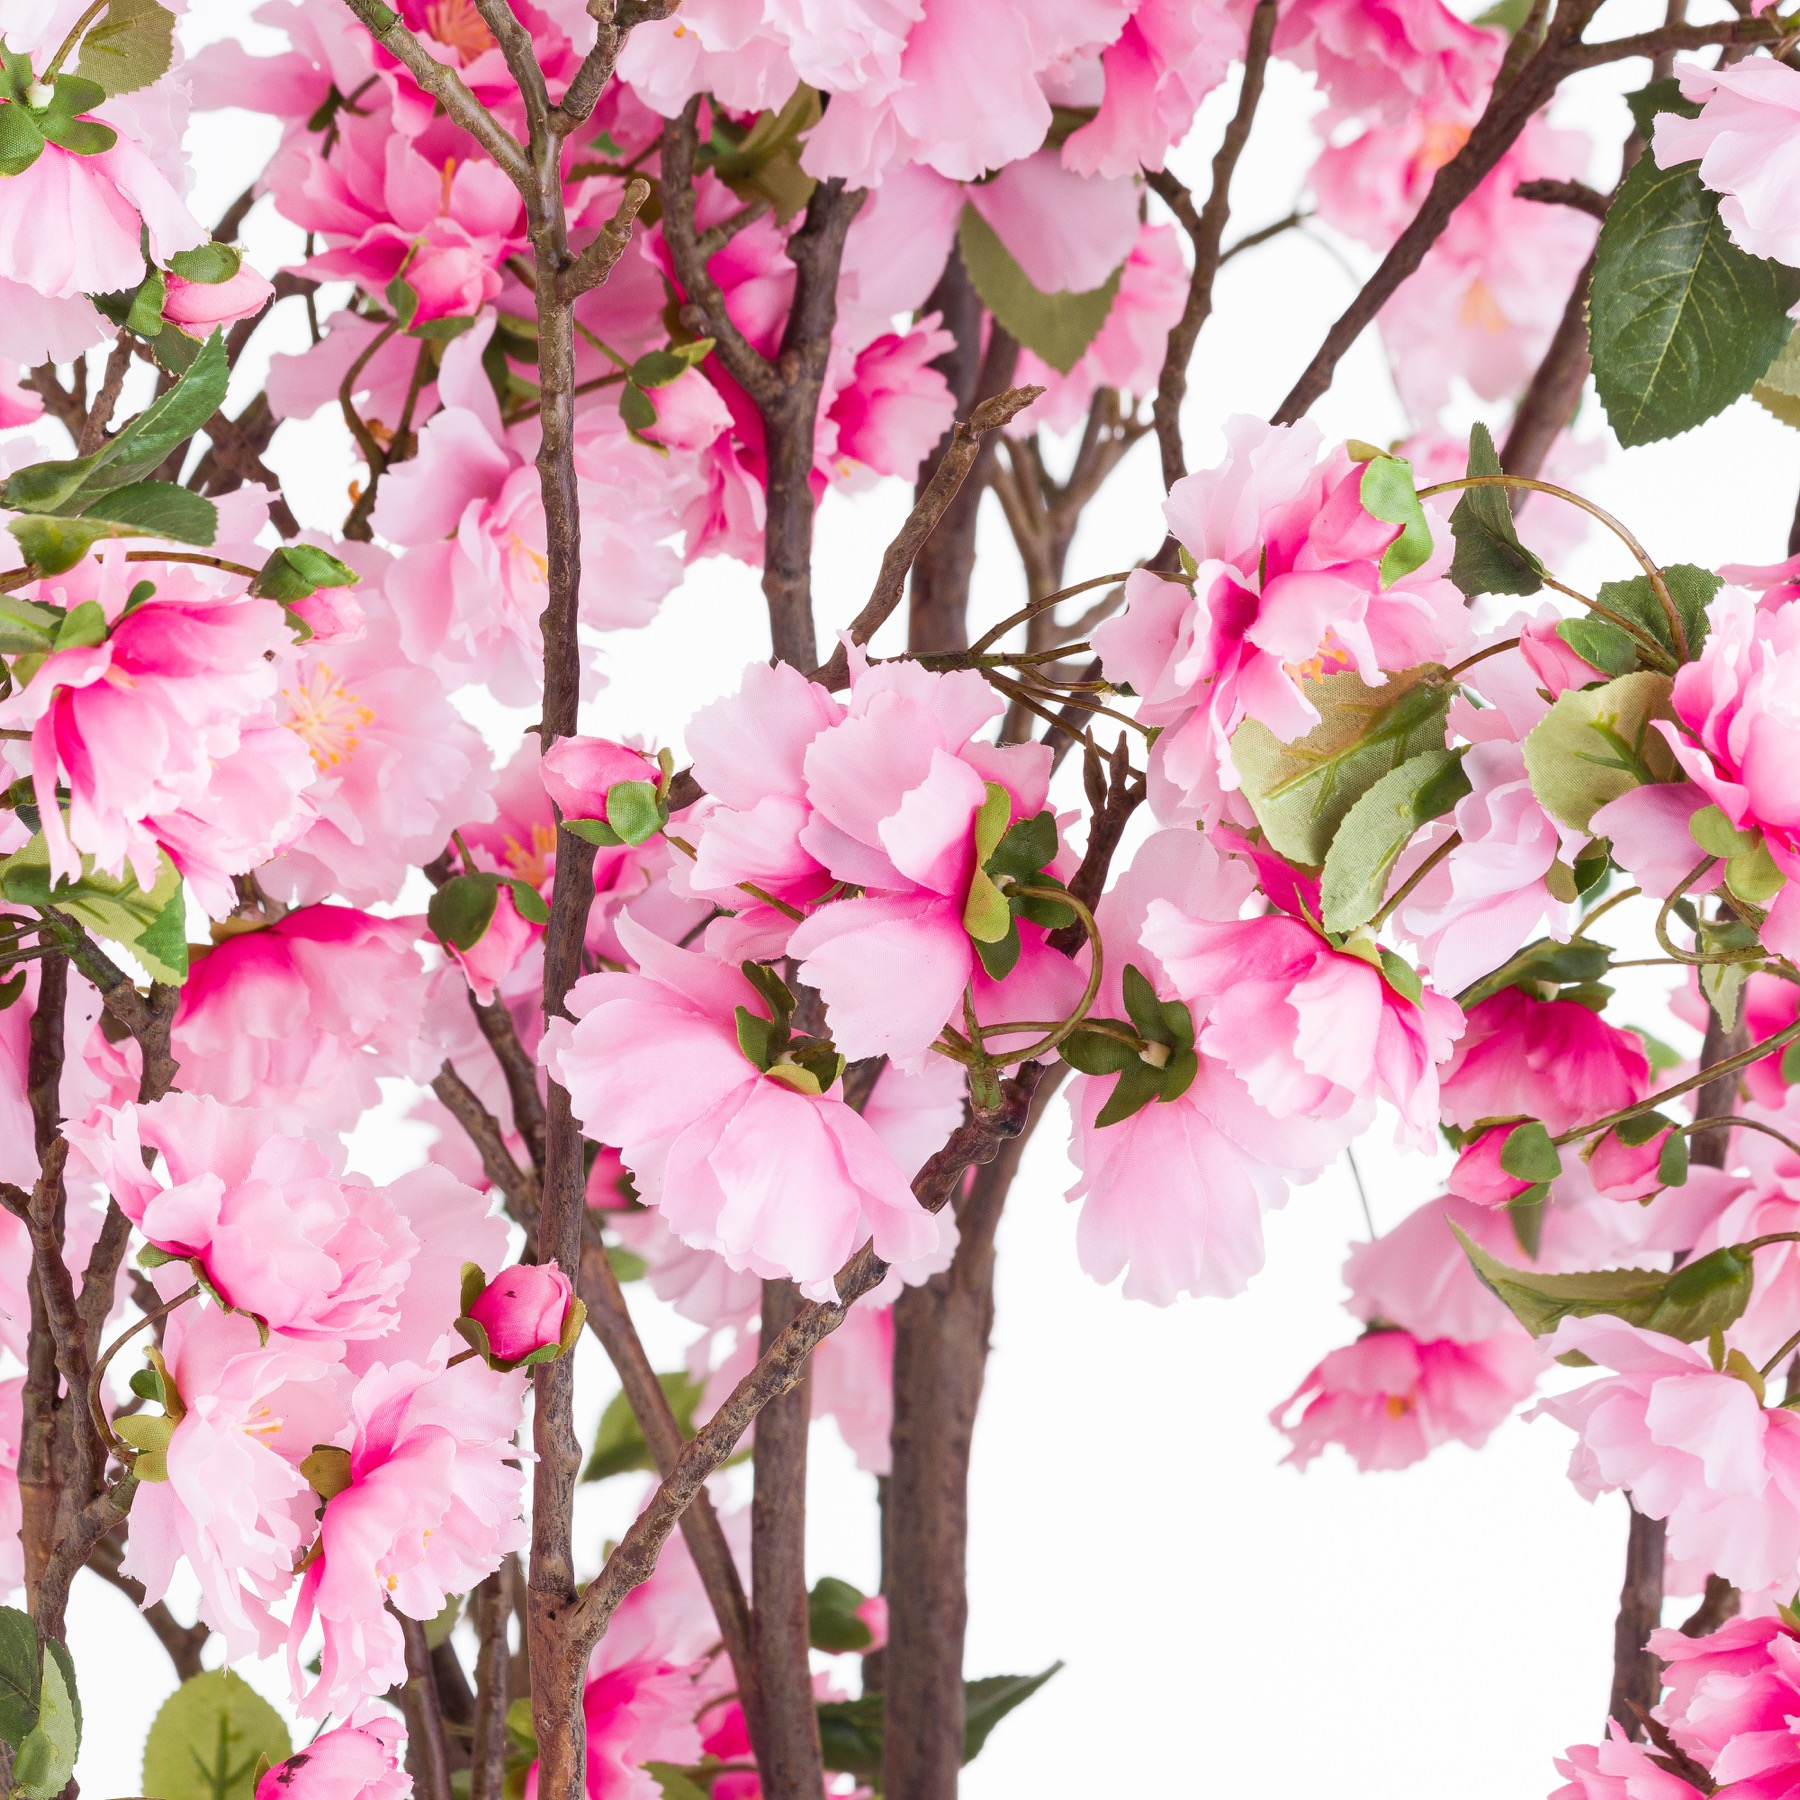 Large Cherry Blossom Tree - Image 2